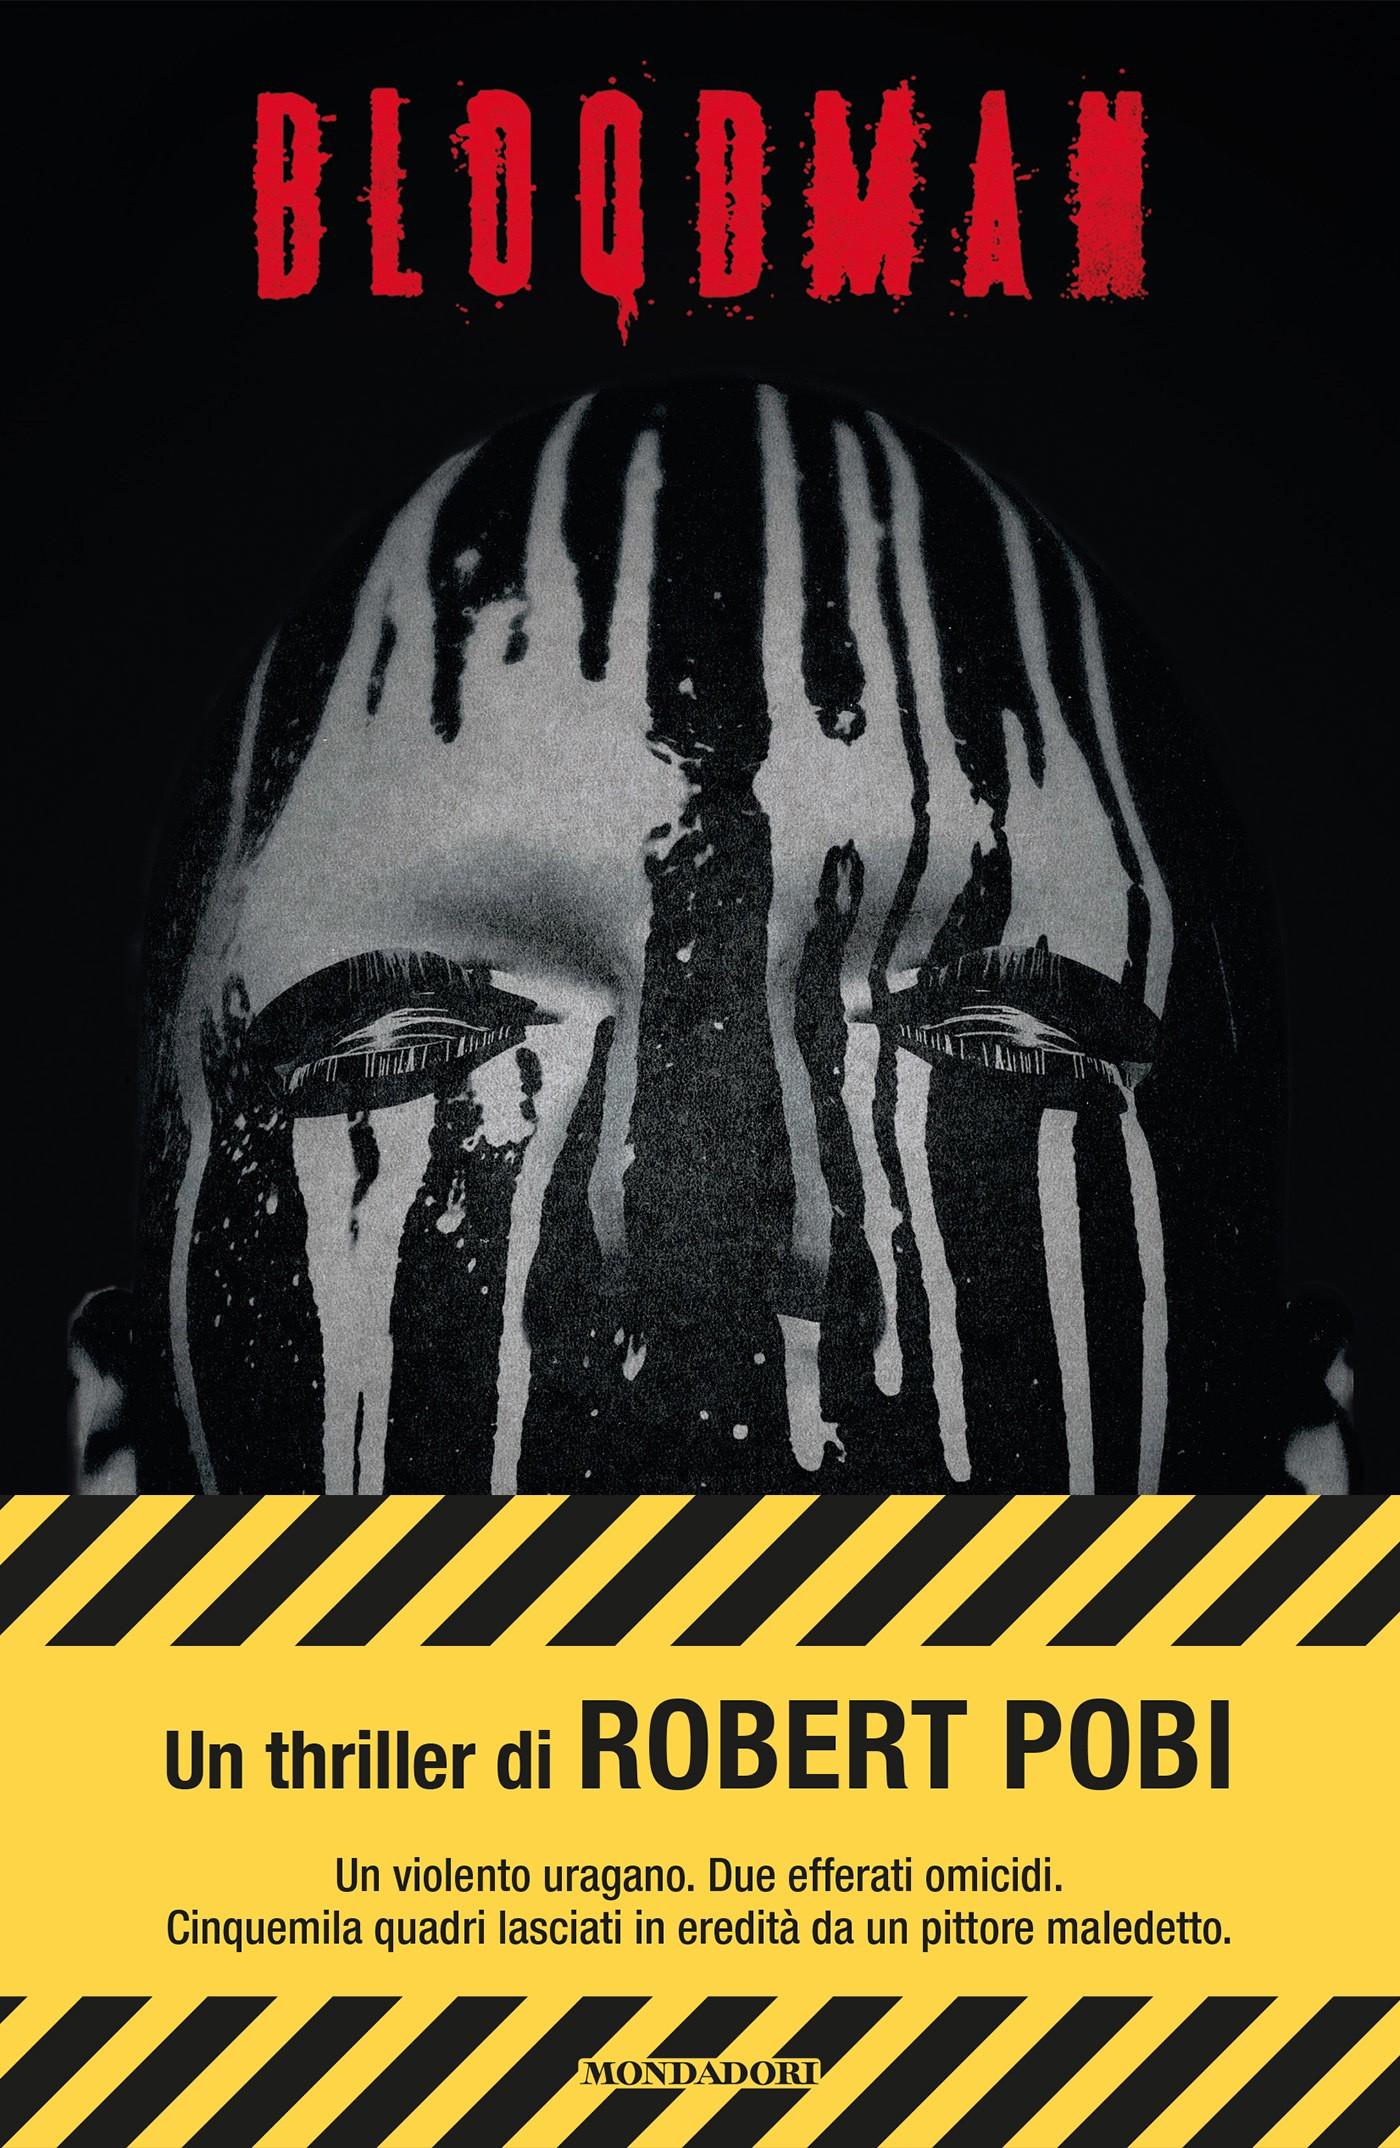 Book Cover Images Api : Bloodman robert pobi ebook bookrepublic